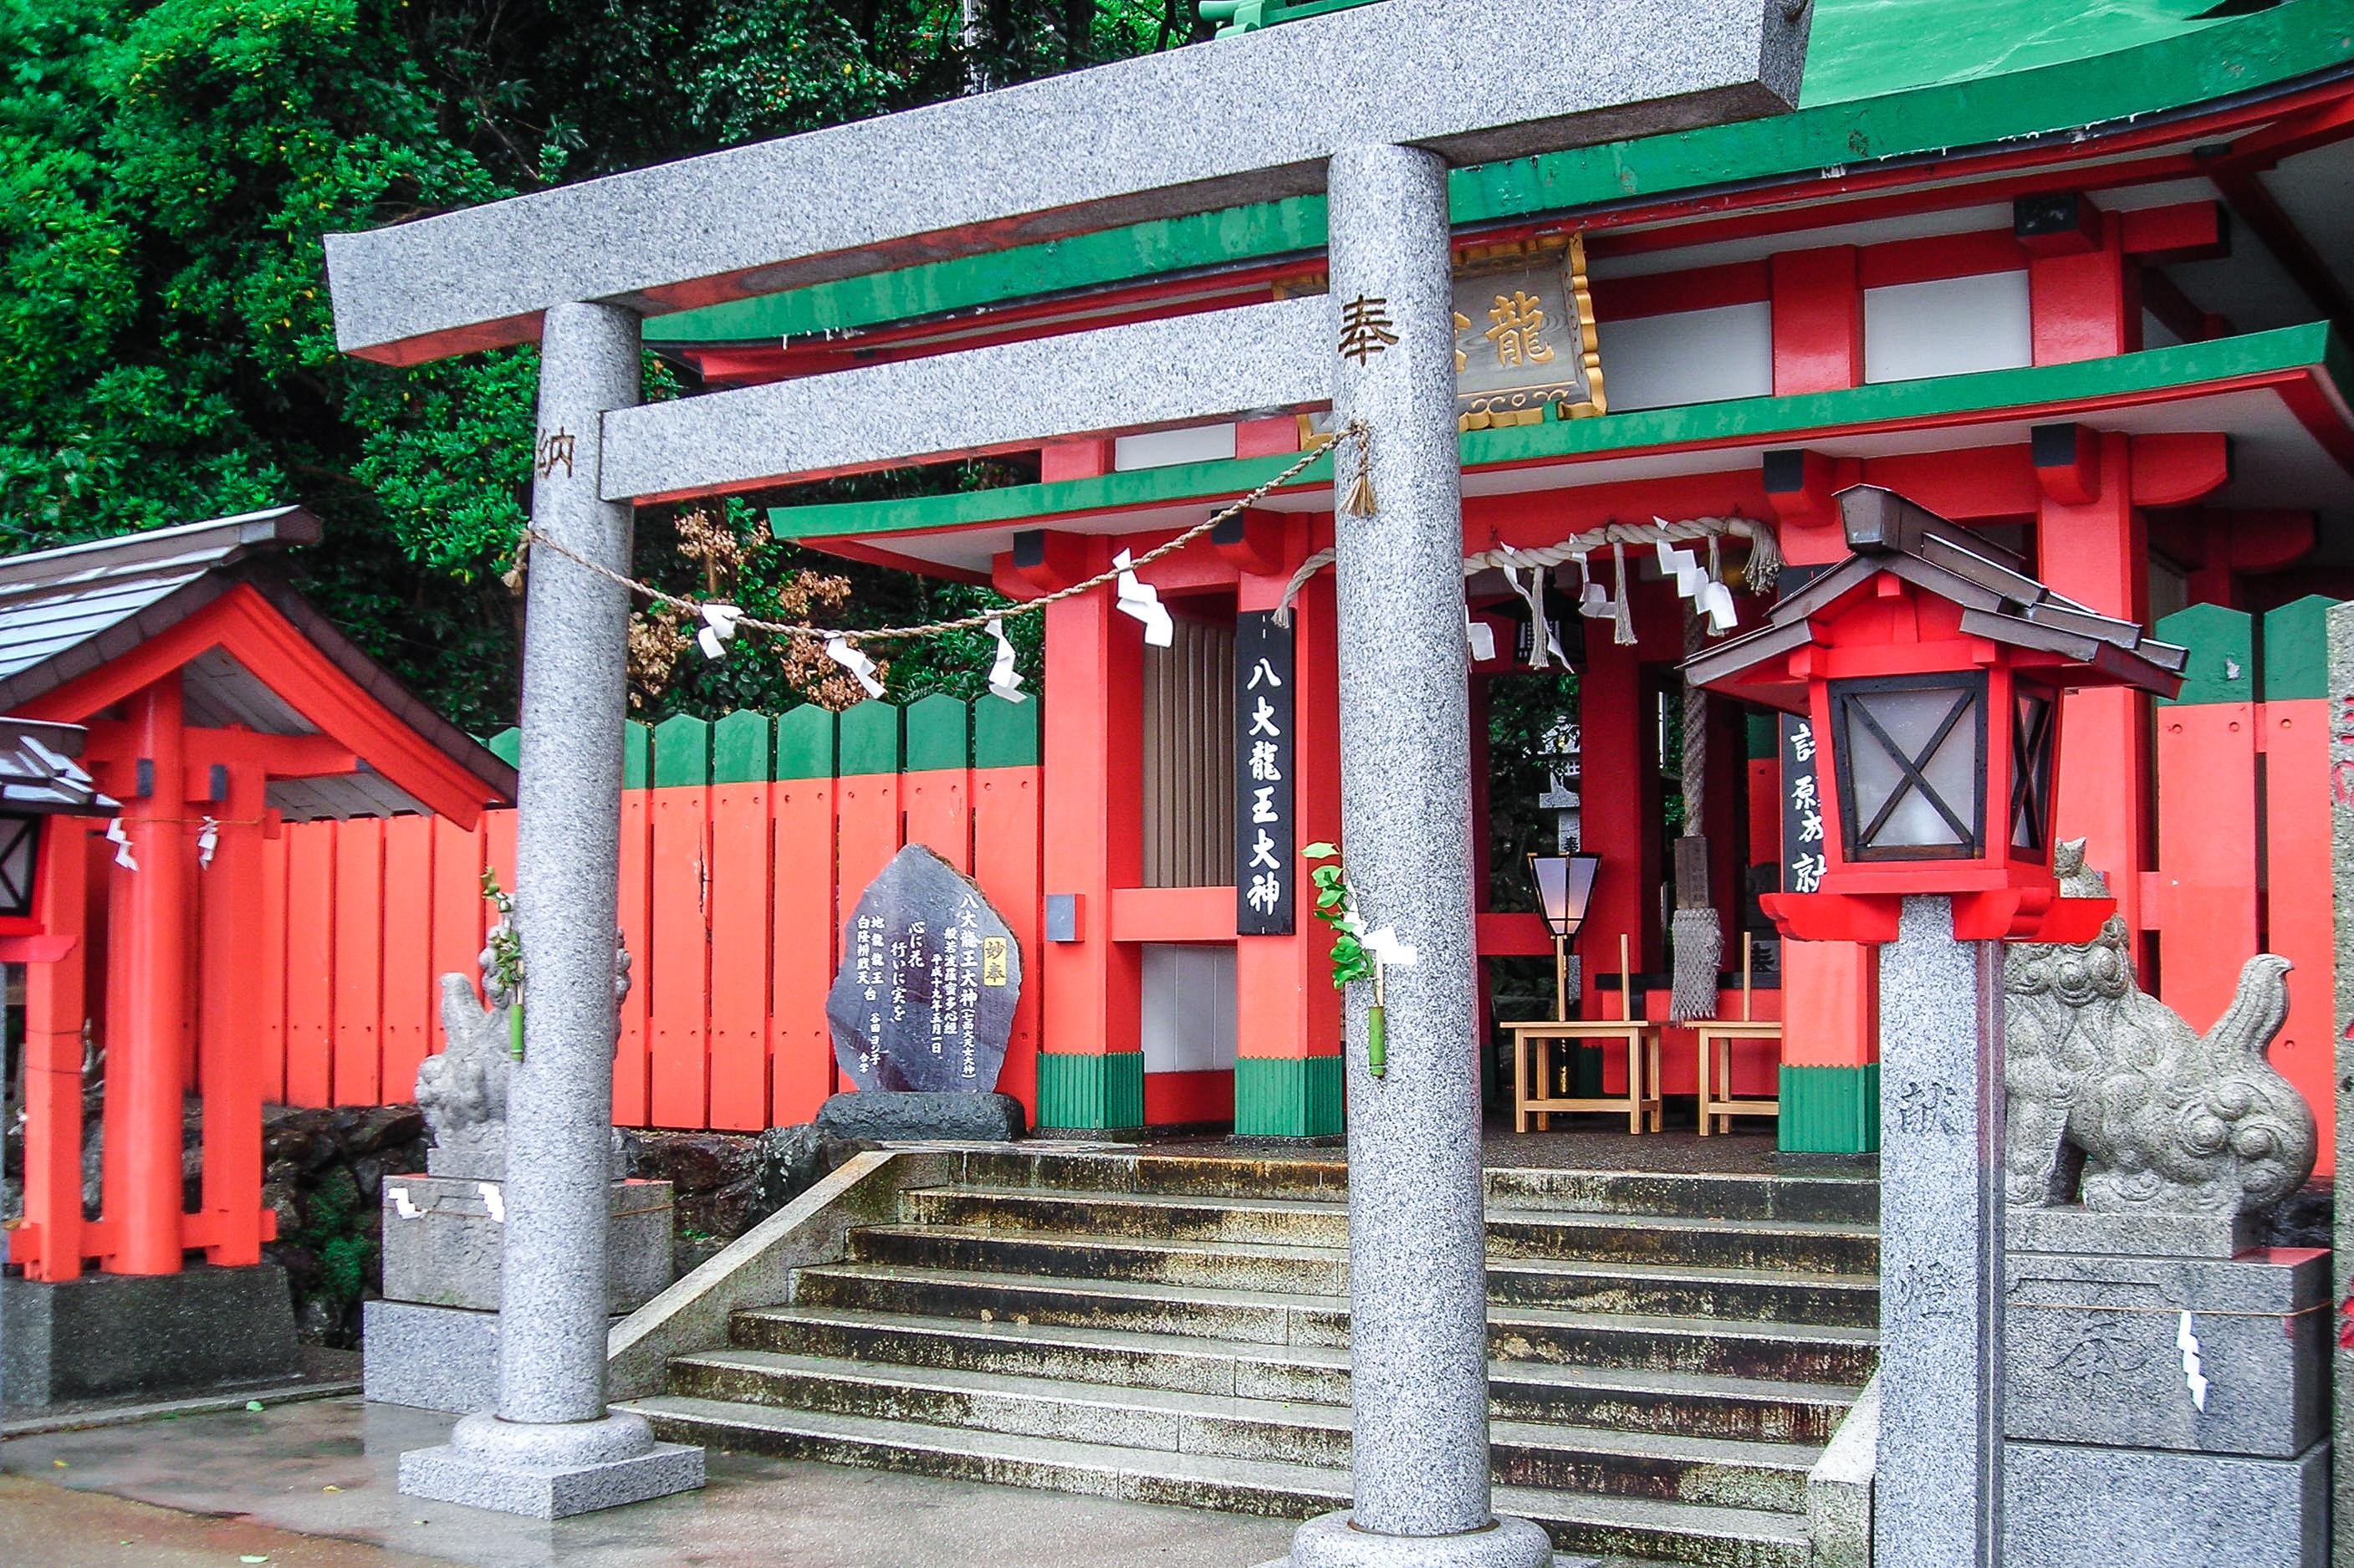 Mie Prefecture and Ise Jingu